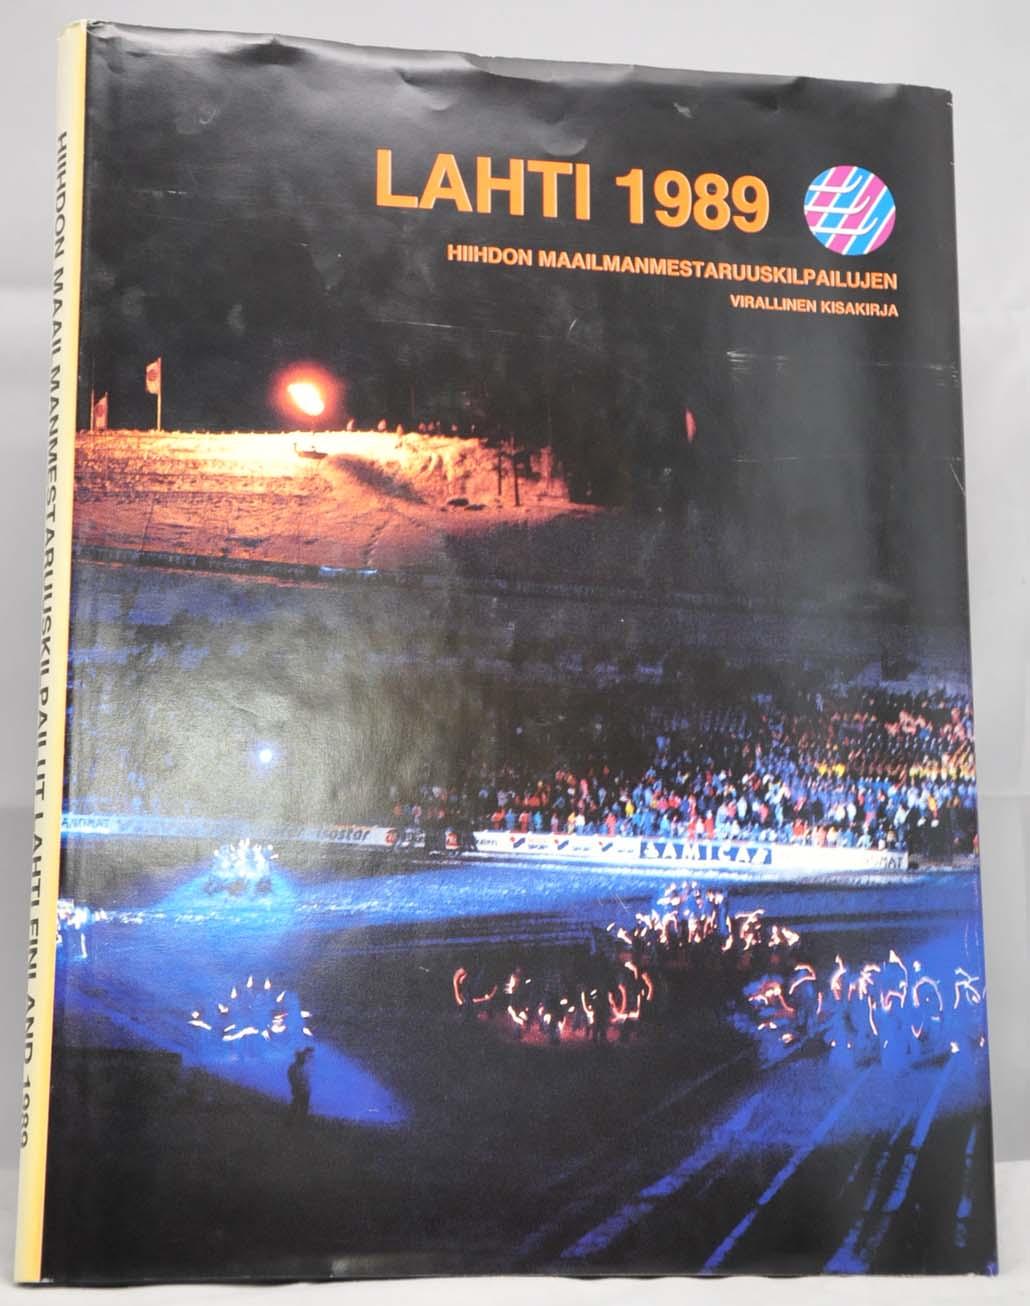 Lahti 1989